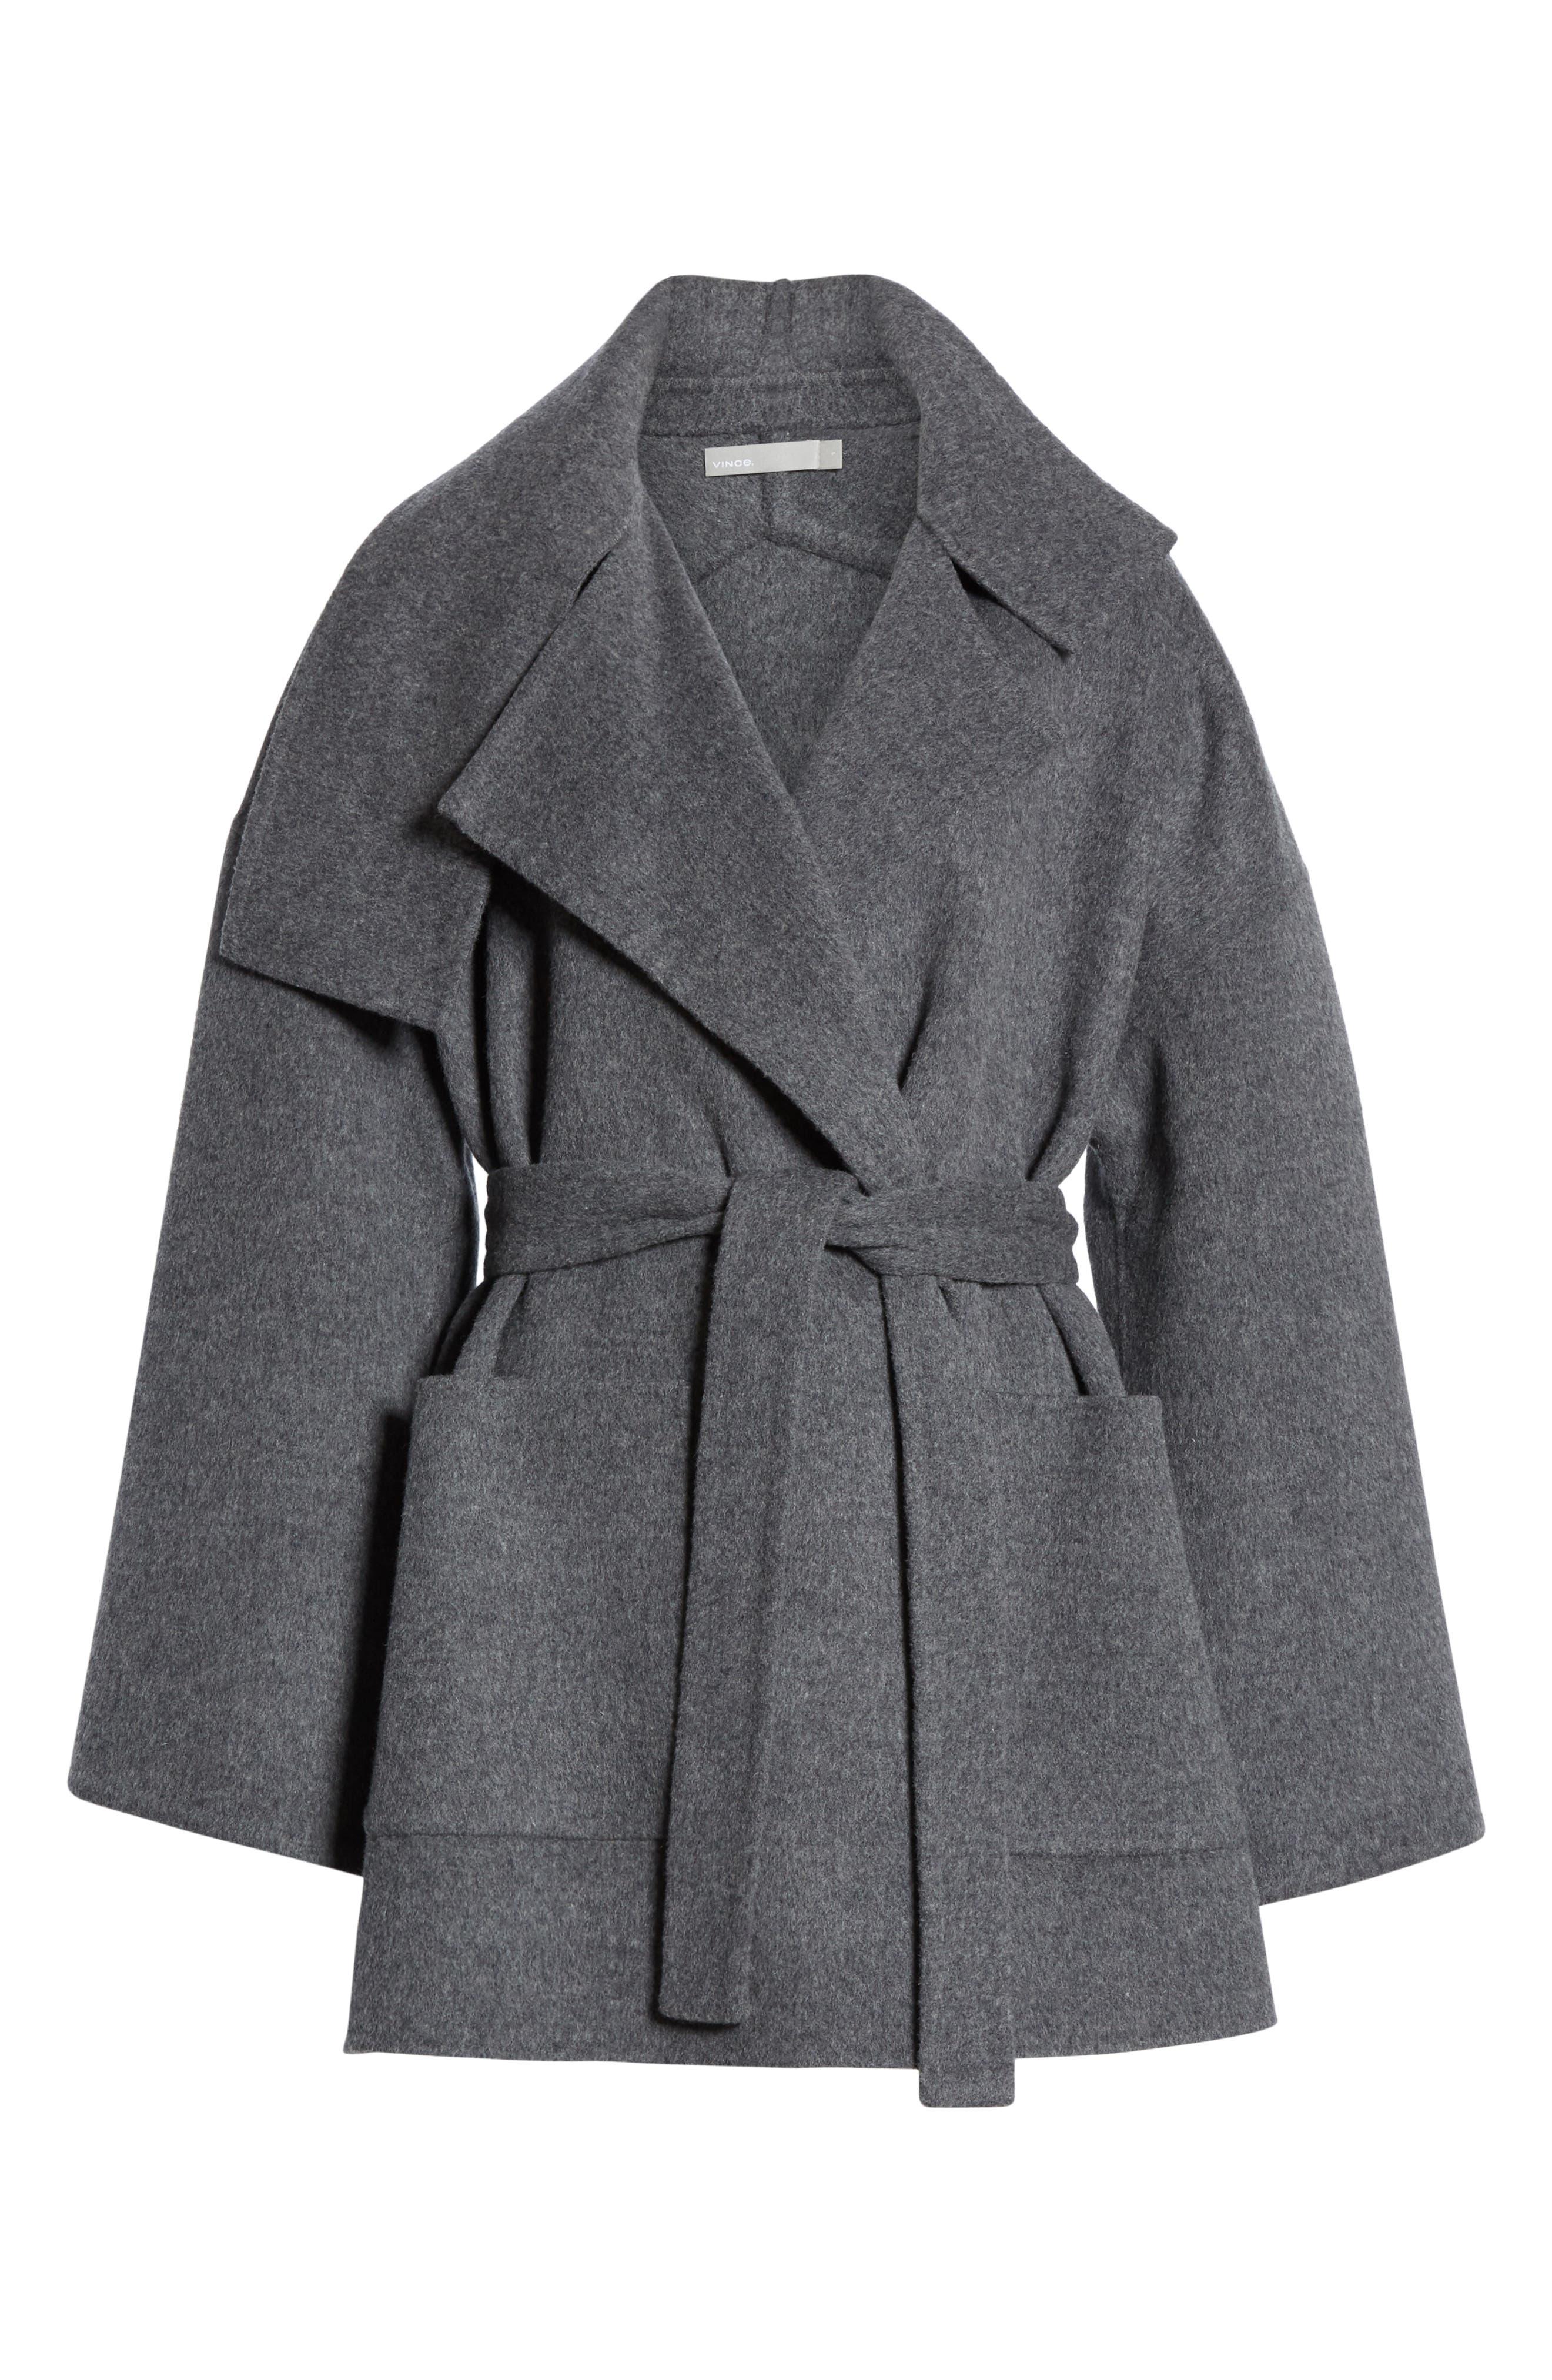 Blanket Coat,                             Alternate thumbnail 6, color,                             H GREY